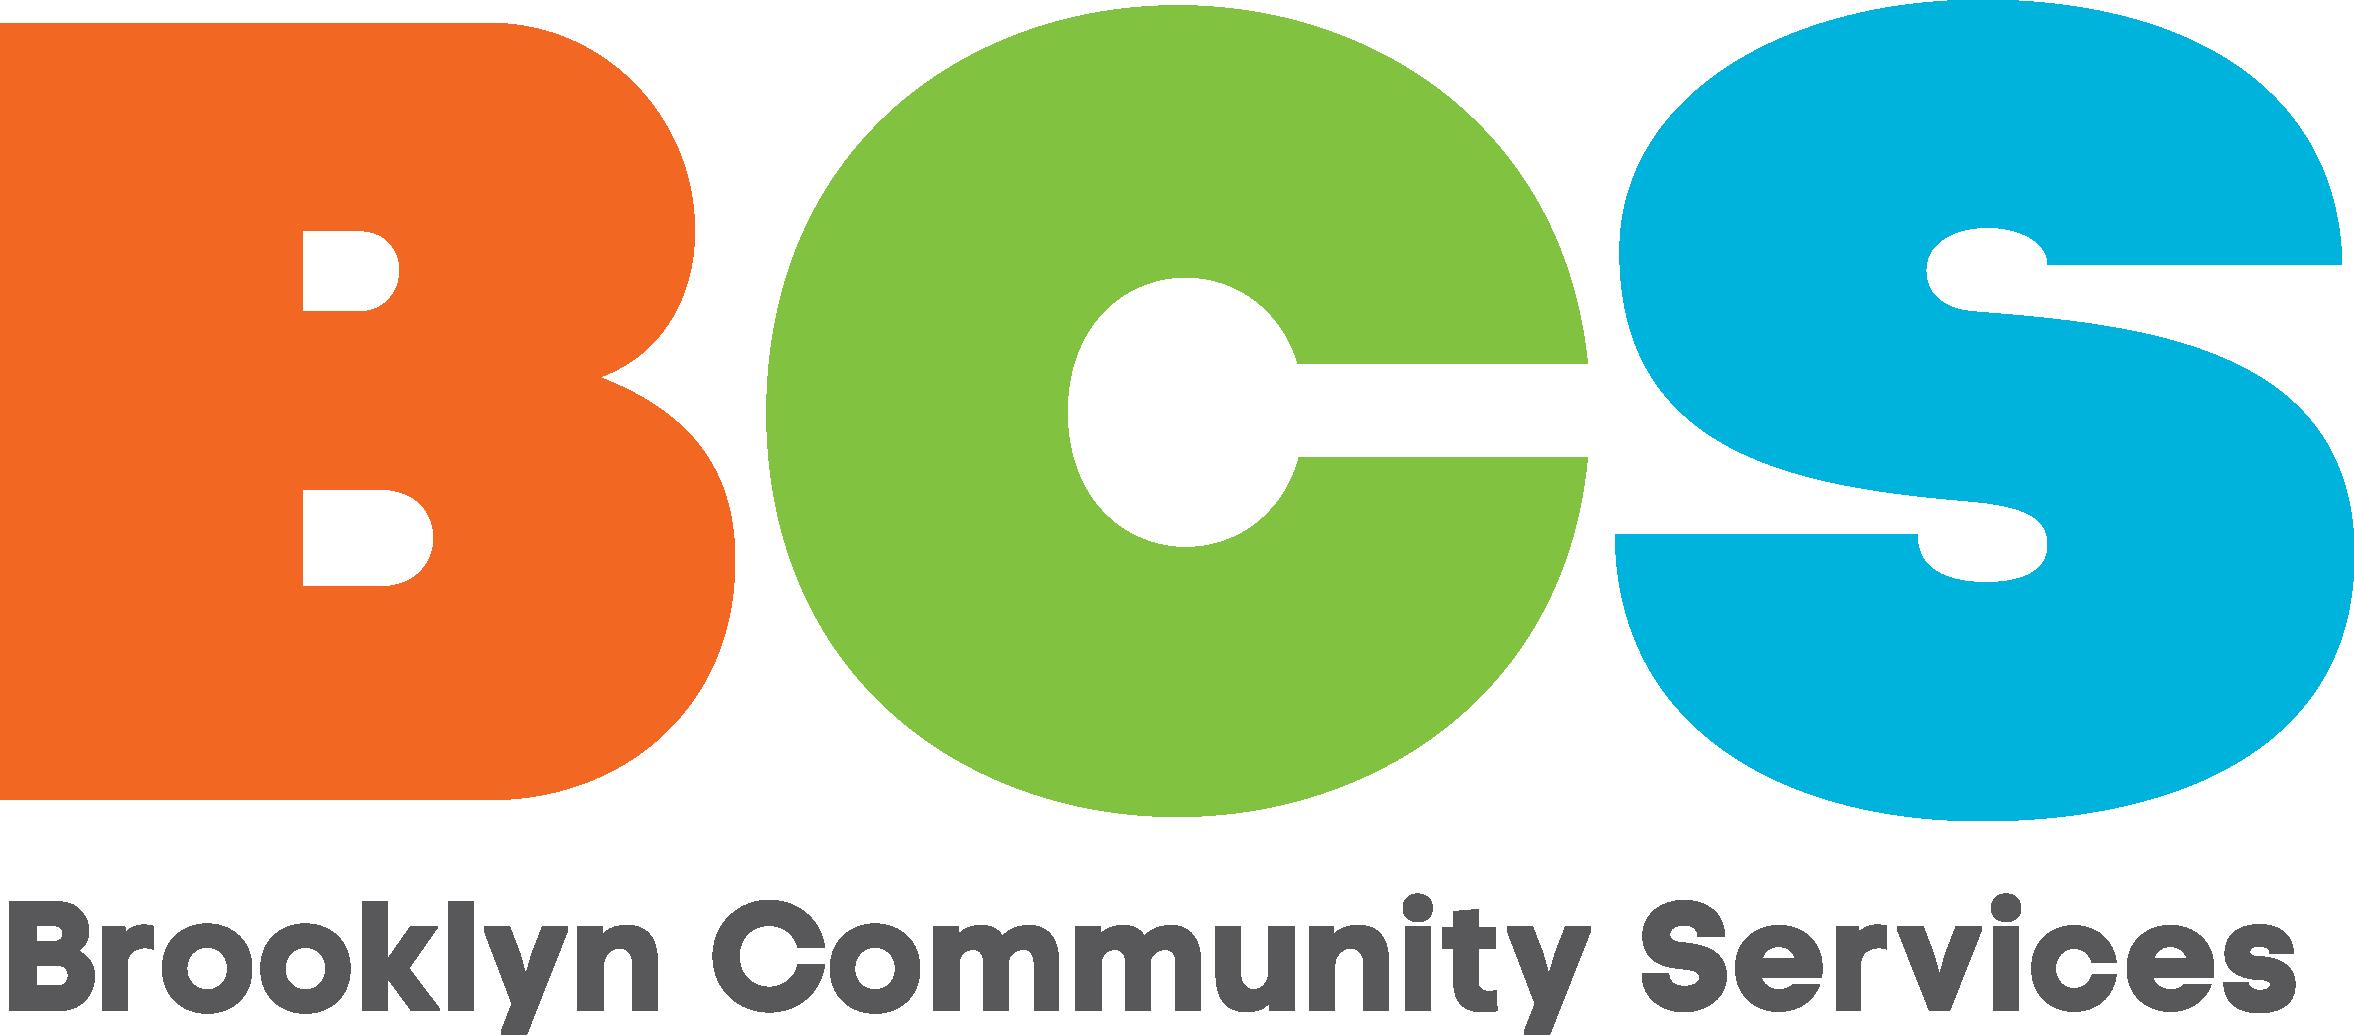 Volunteering clipart civic responsibility. Volunteer brooklyn community services